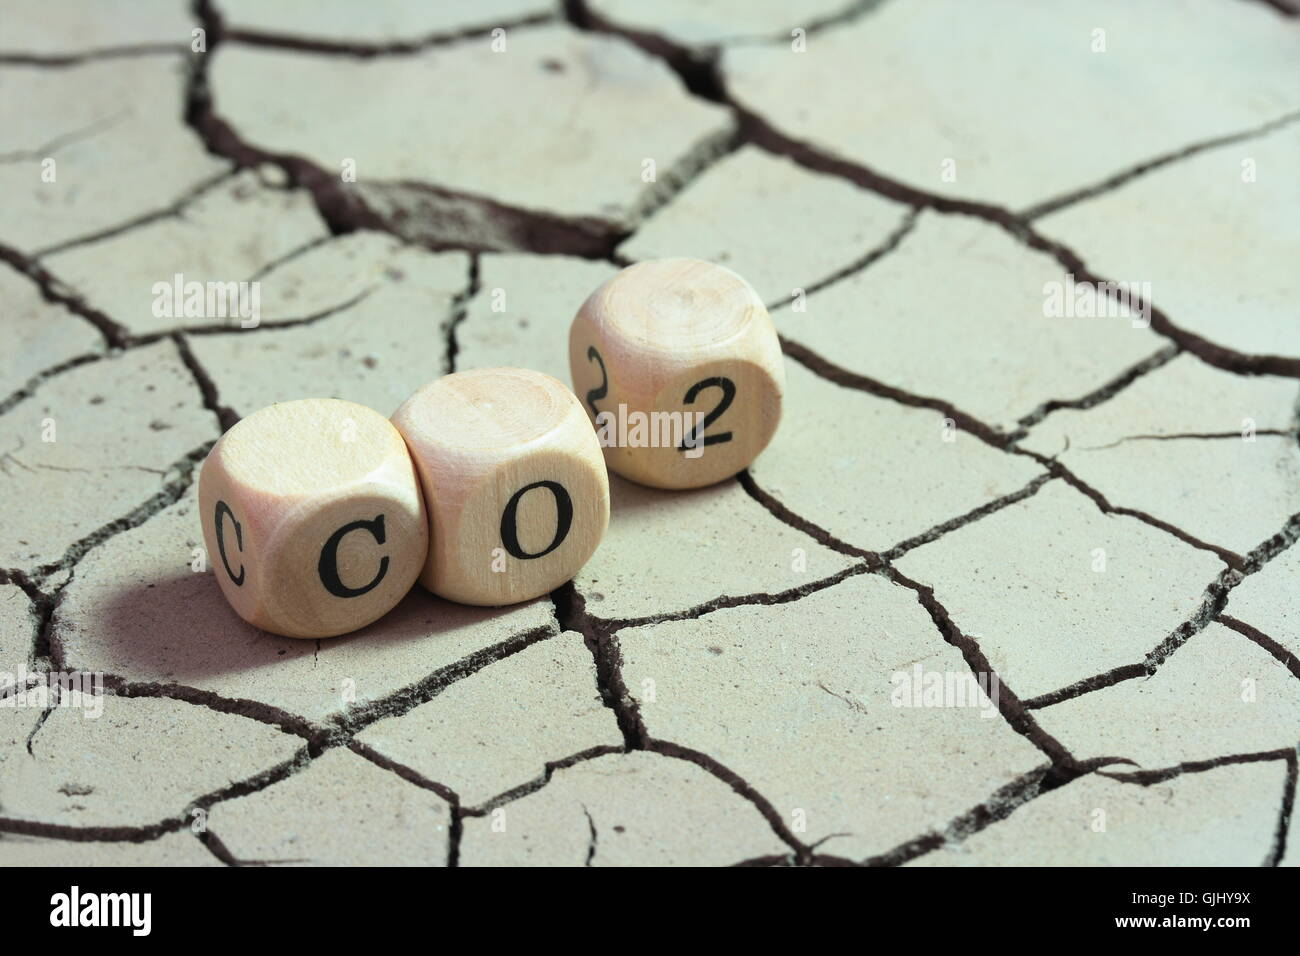 dryness emission greenhouse effect - Stock Image